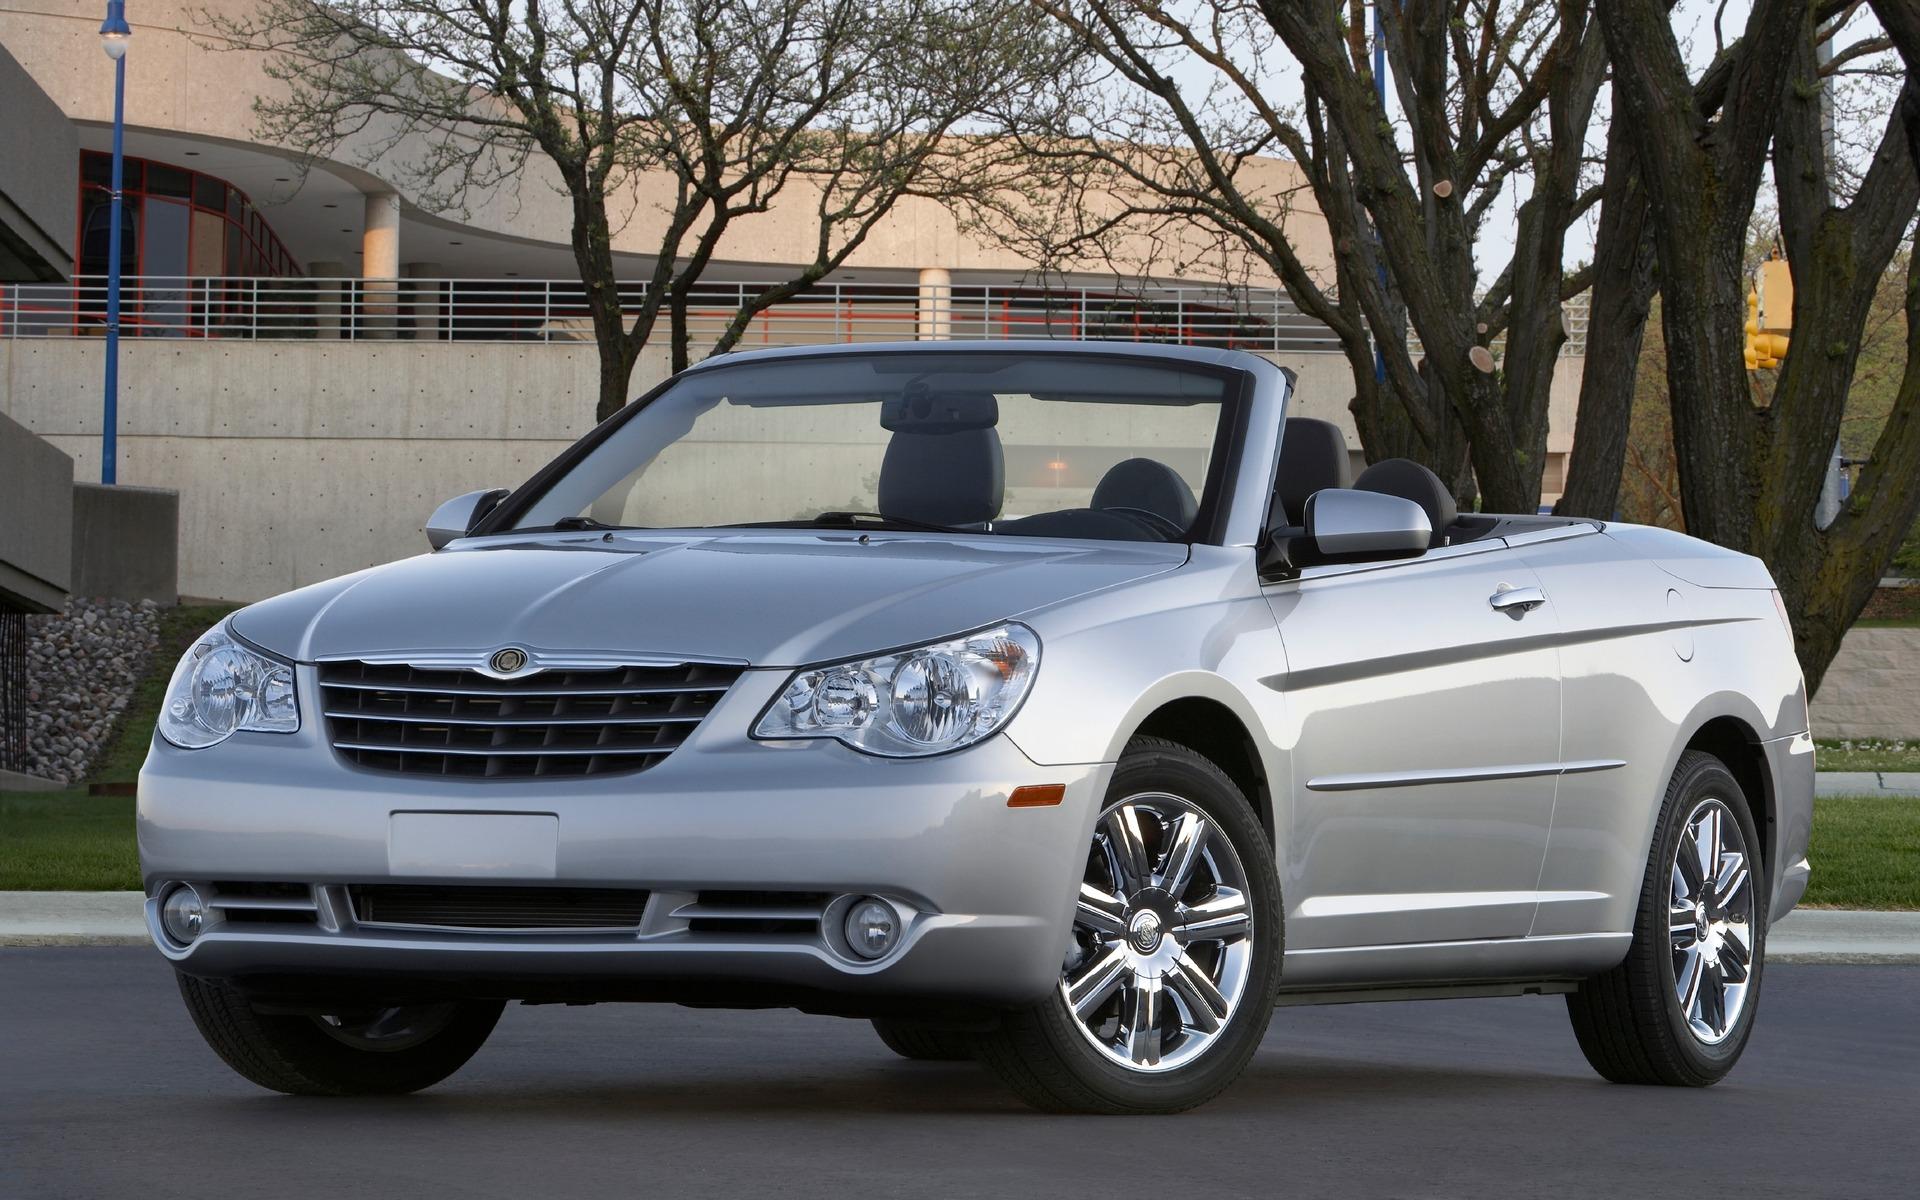 2010 Chrysler Sebring Décapotable